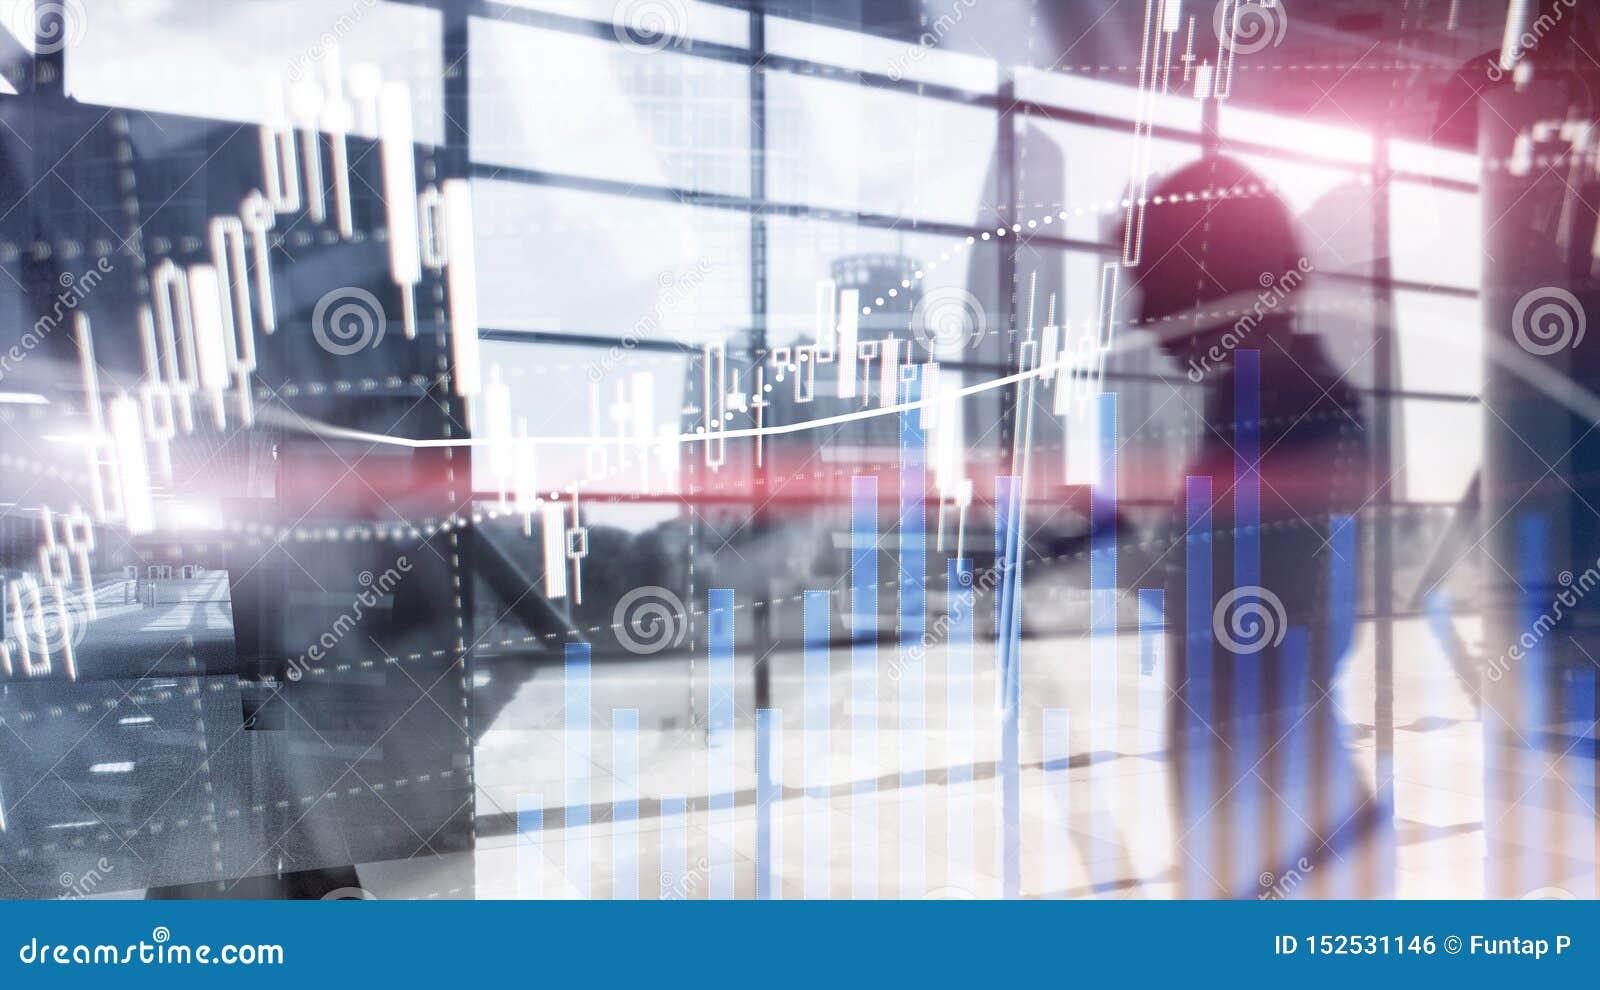 Forex που κάνουν εμπόριο, χρηματοοικονομική αγορά, έννοια επένδυσης στο υπόβαθρο εμπορικών κέντρων